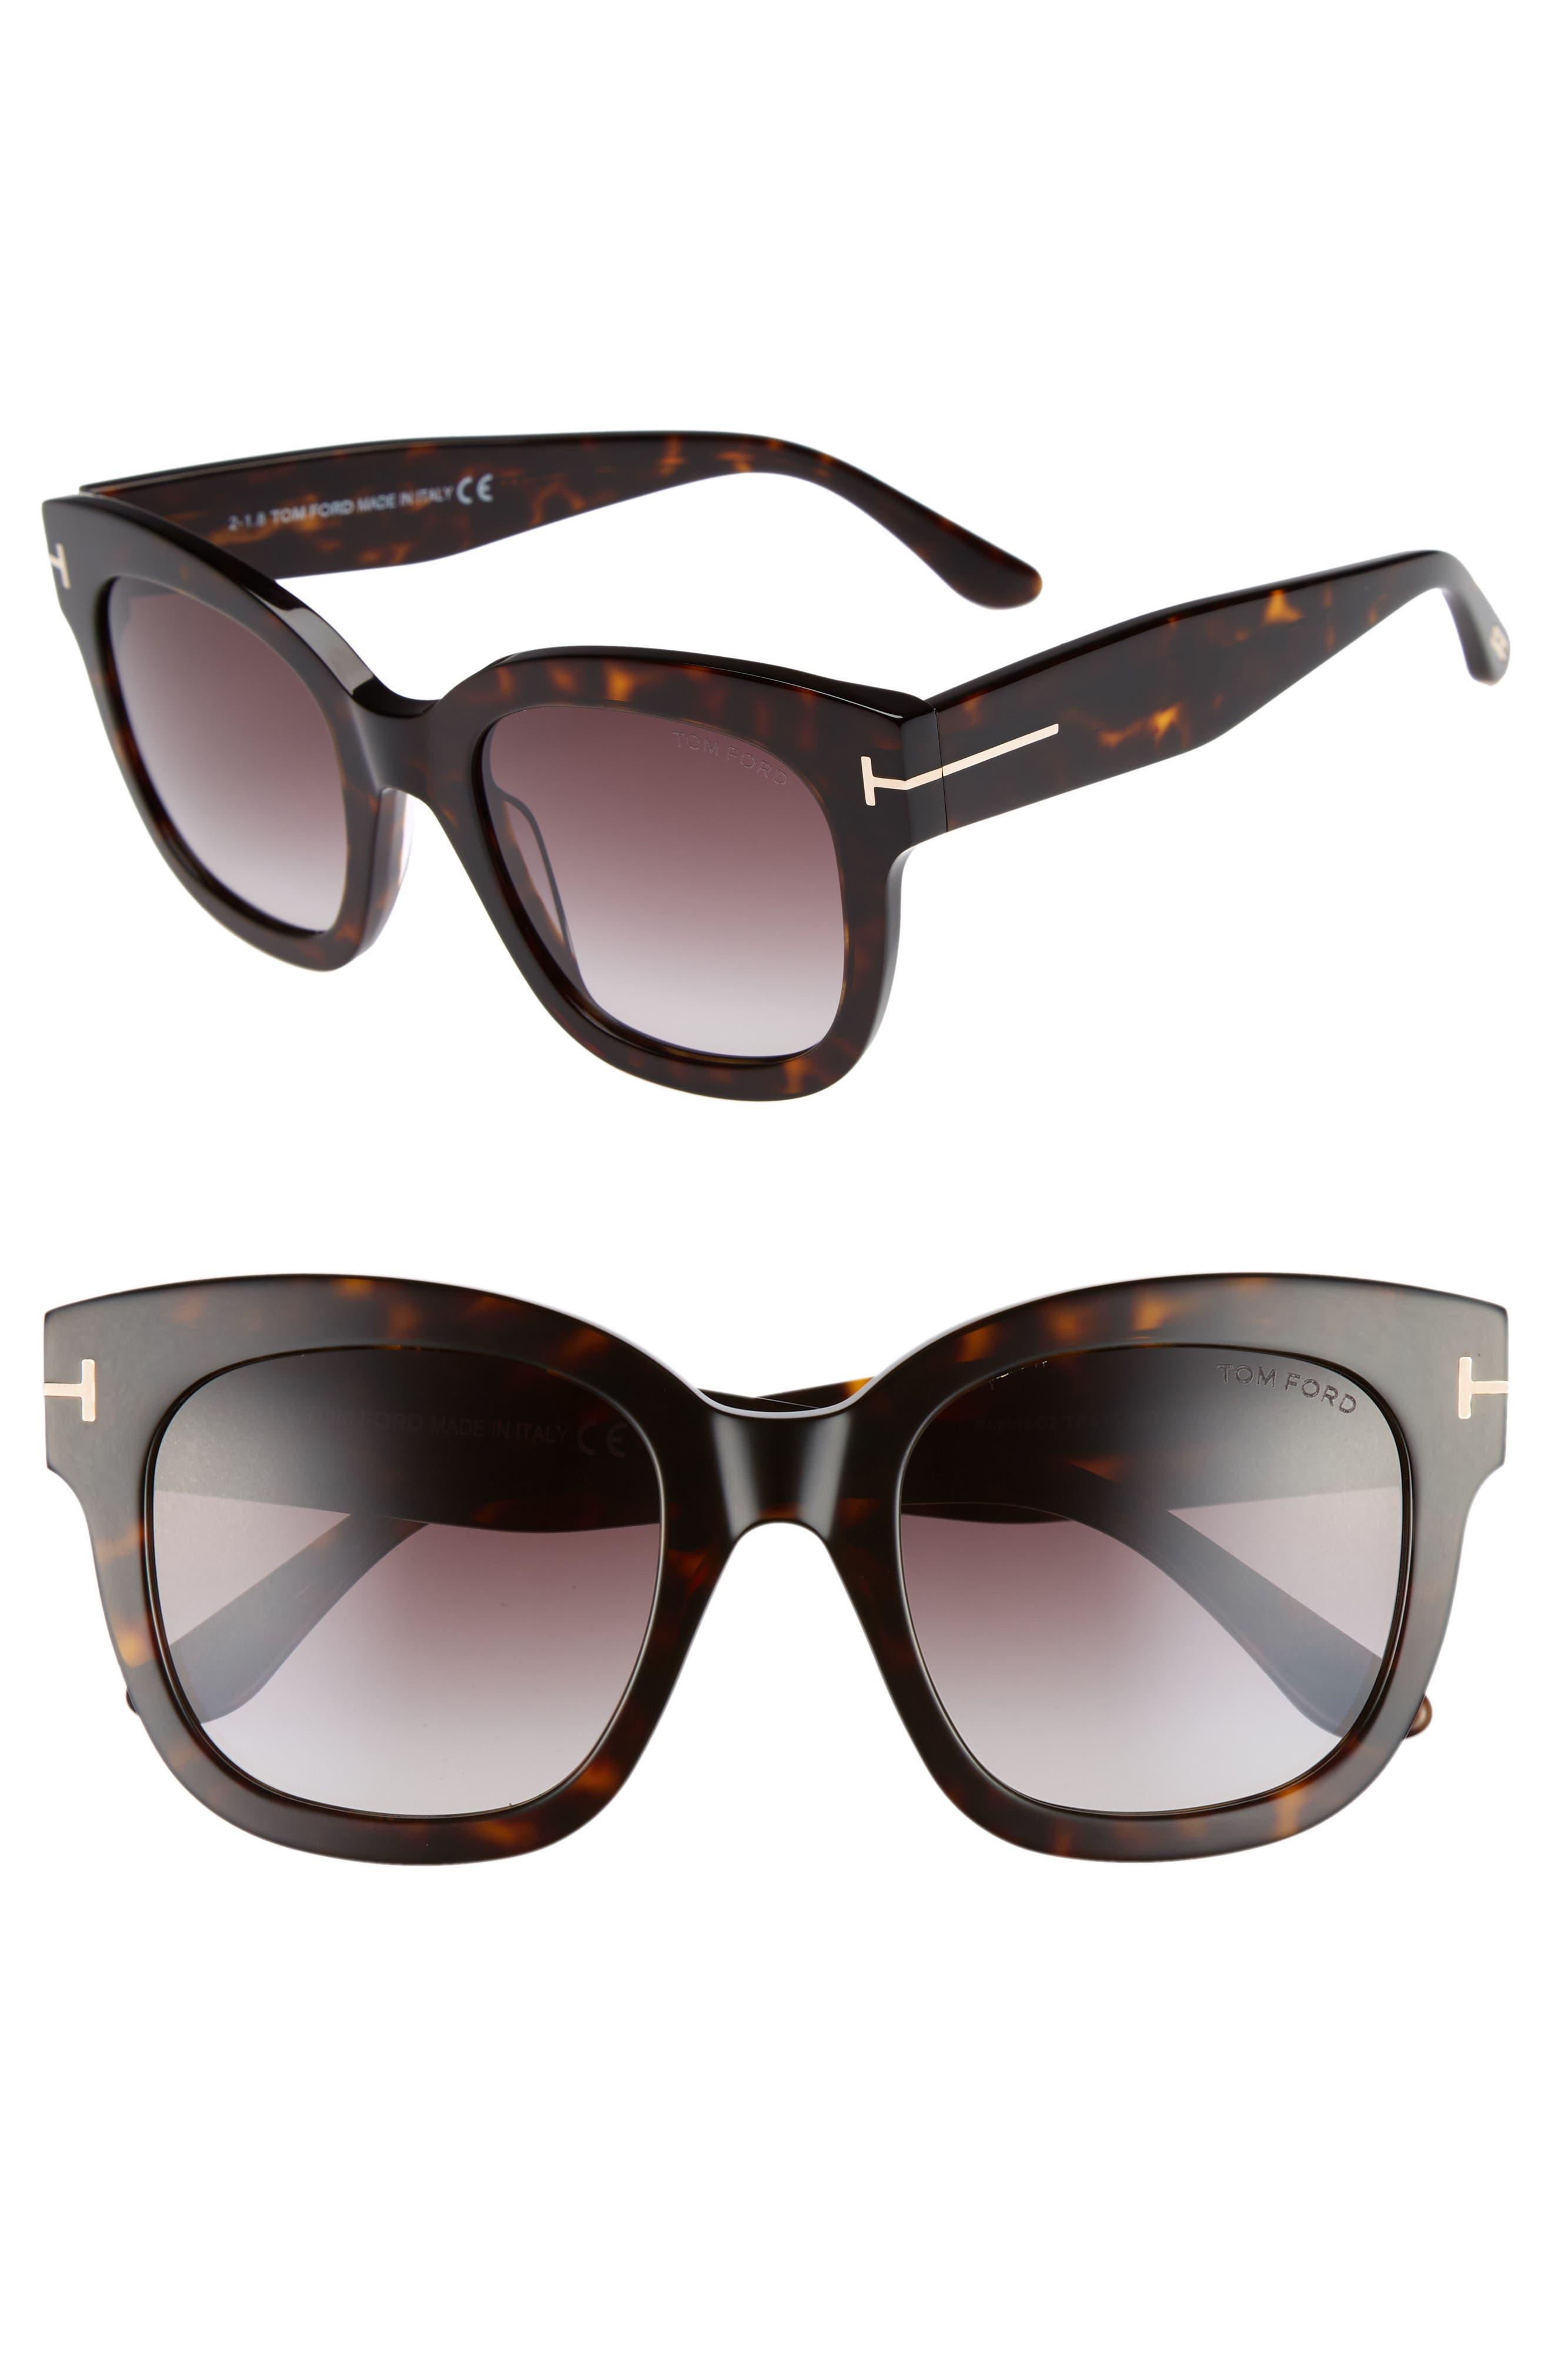 Beatrix 52mm Sunglasses,                             Main thumbnail 1, color,                             Dark Havana/ Gradient Bordeaux